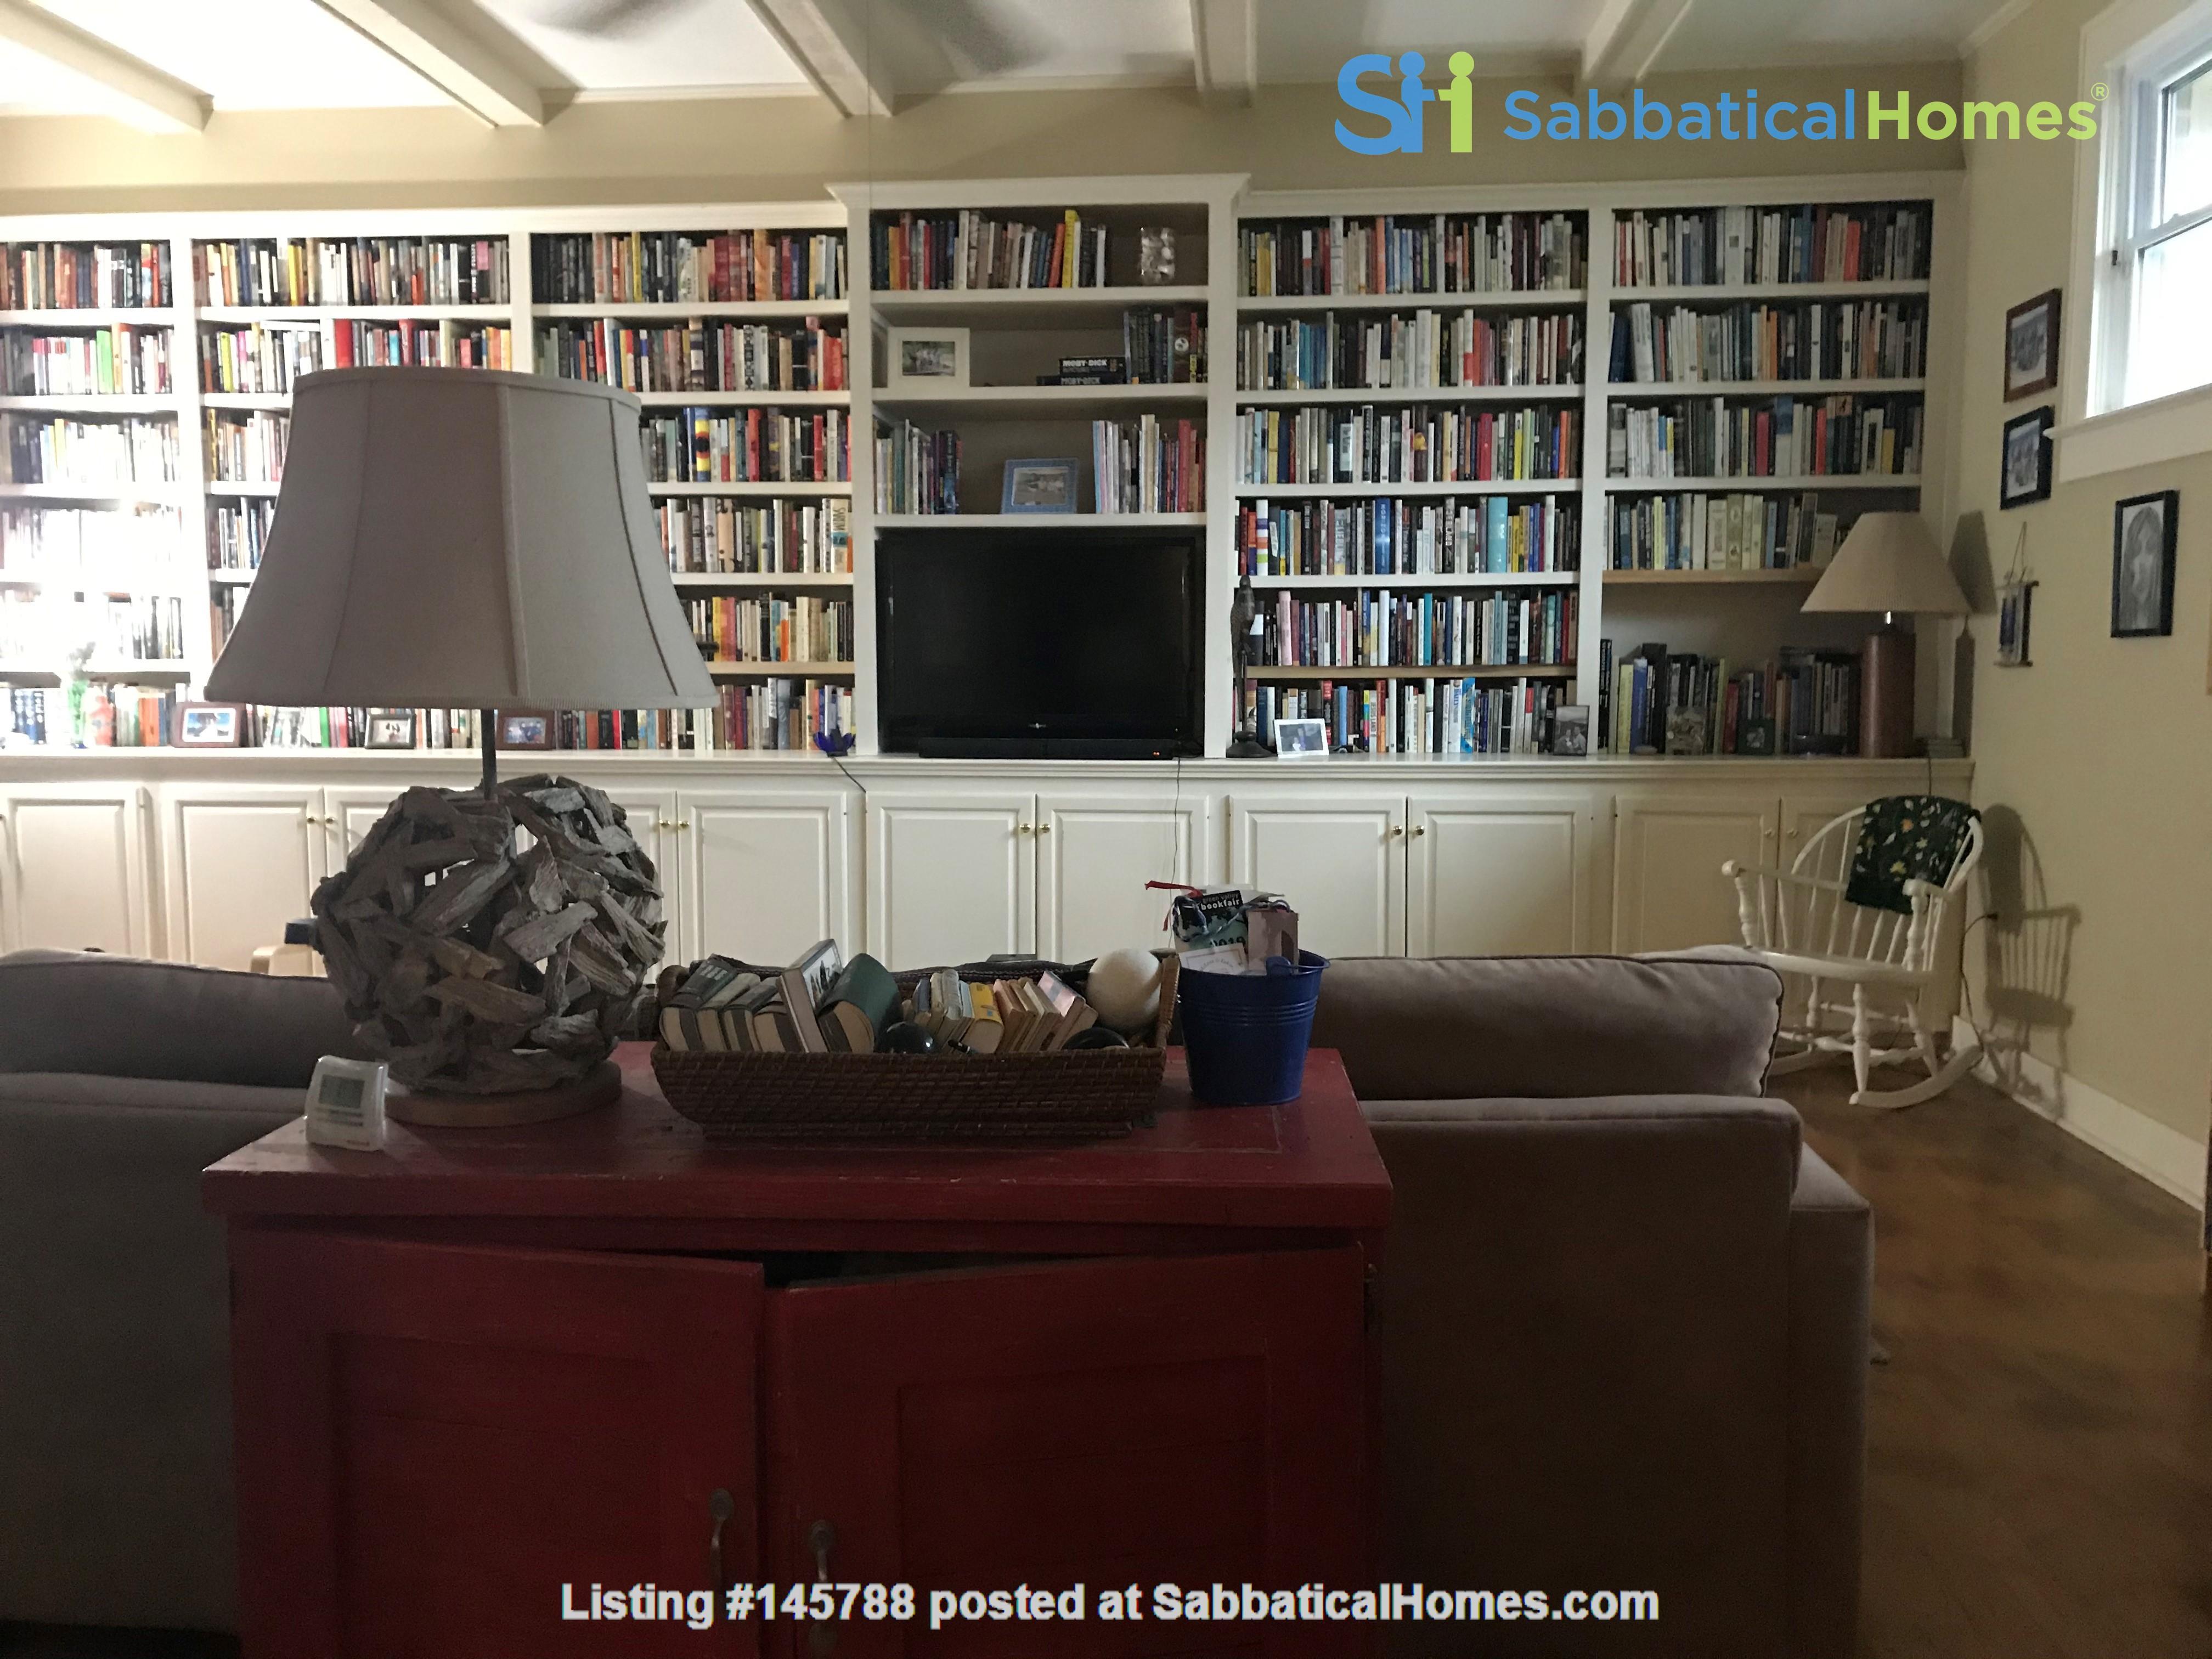 Charming 3 bedroom bungalow in Baton Rouge, Louisiana near LSU Home Rental in Baton Rouge 9